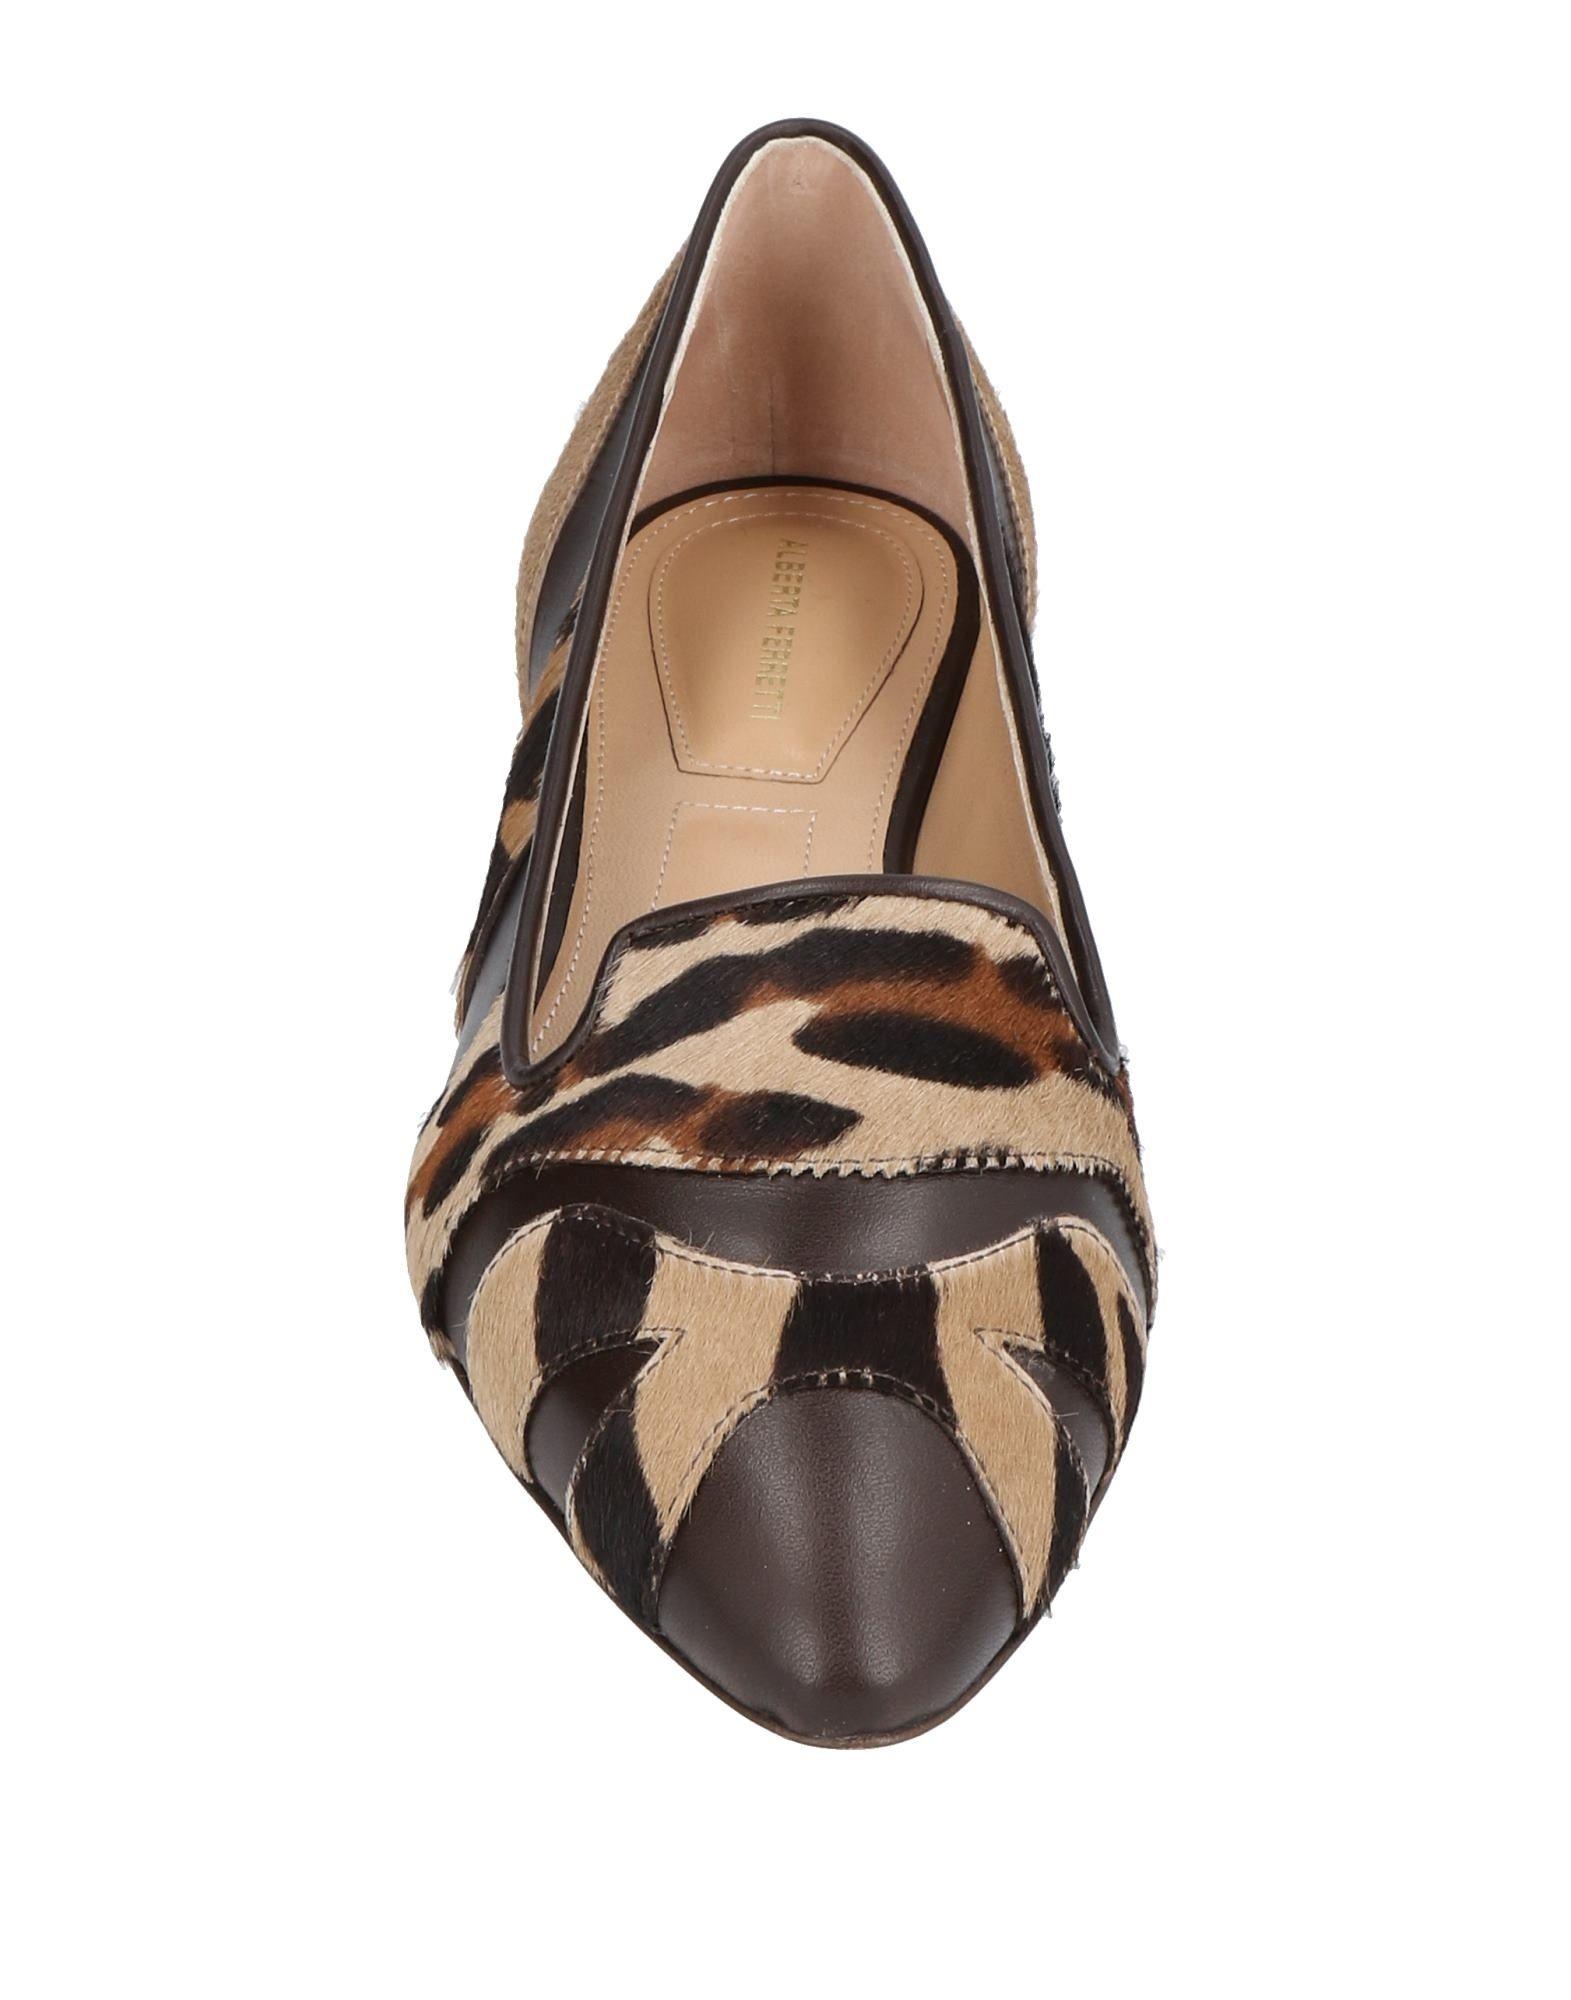 Rabatt Damen Schuhe Alberta Ferretti Mokassins Damen Rabatt  11473982DH 22ddd0